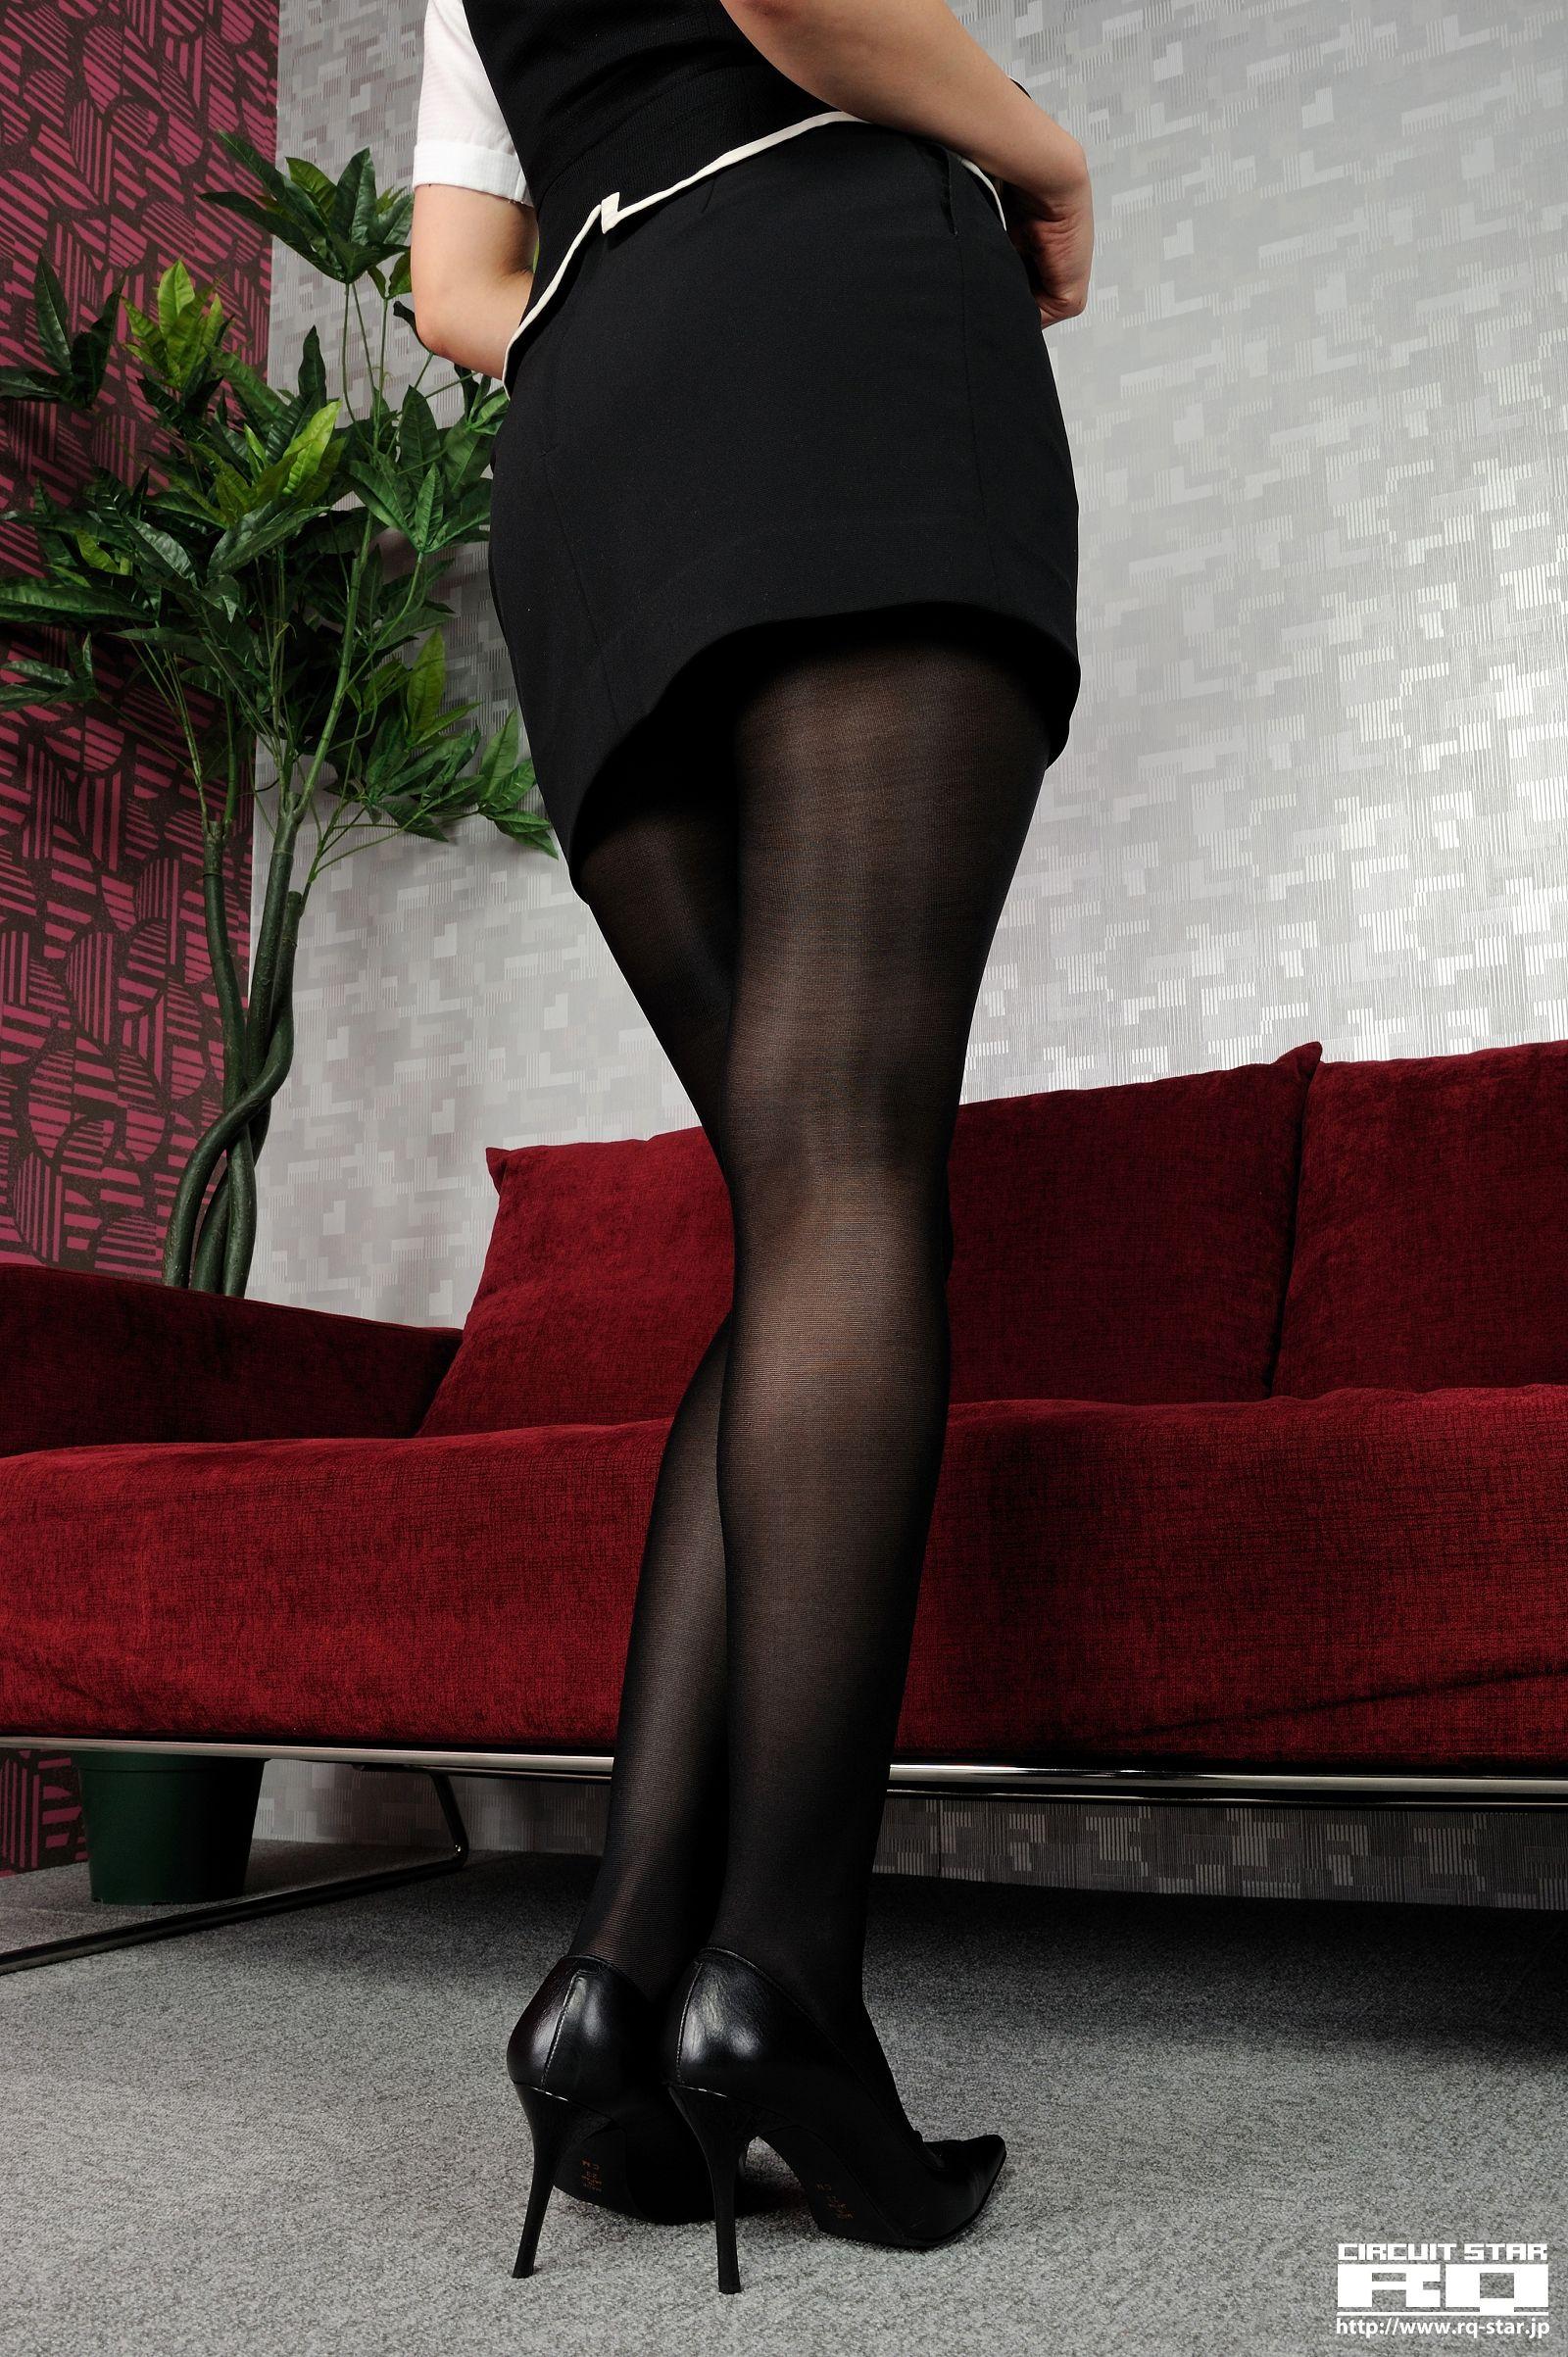 [RQ STAR美女] NO.0355 Mai Asano 浅野舞 Office Lady[88P] RQ STAR 第3张